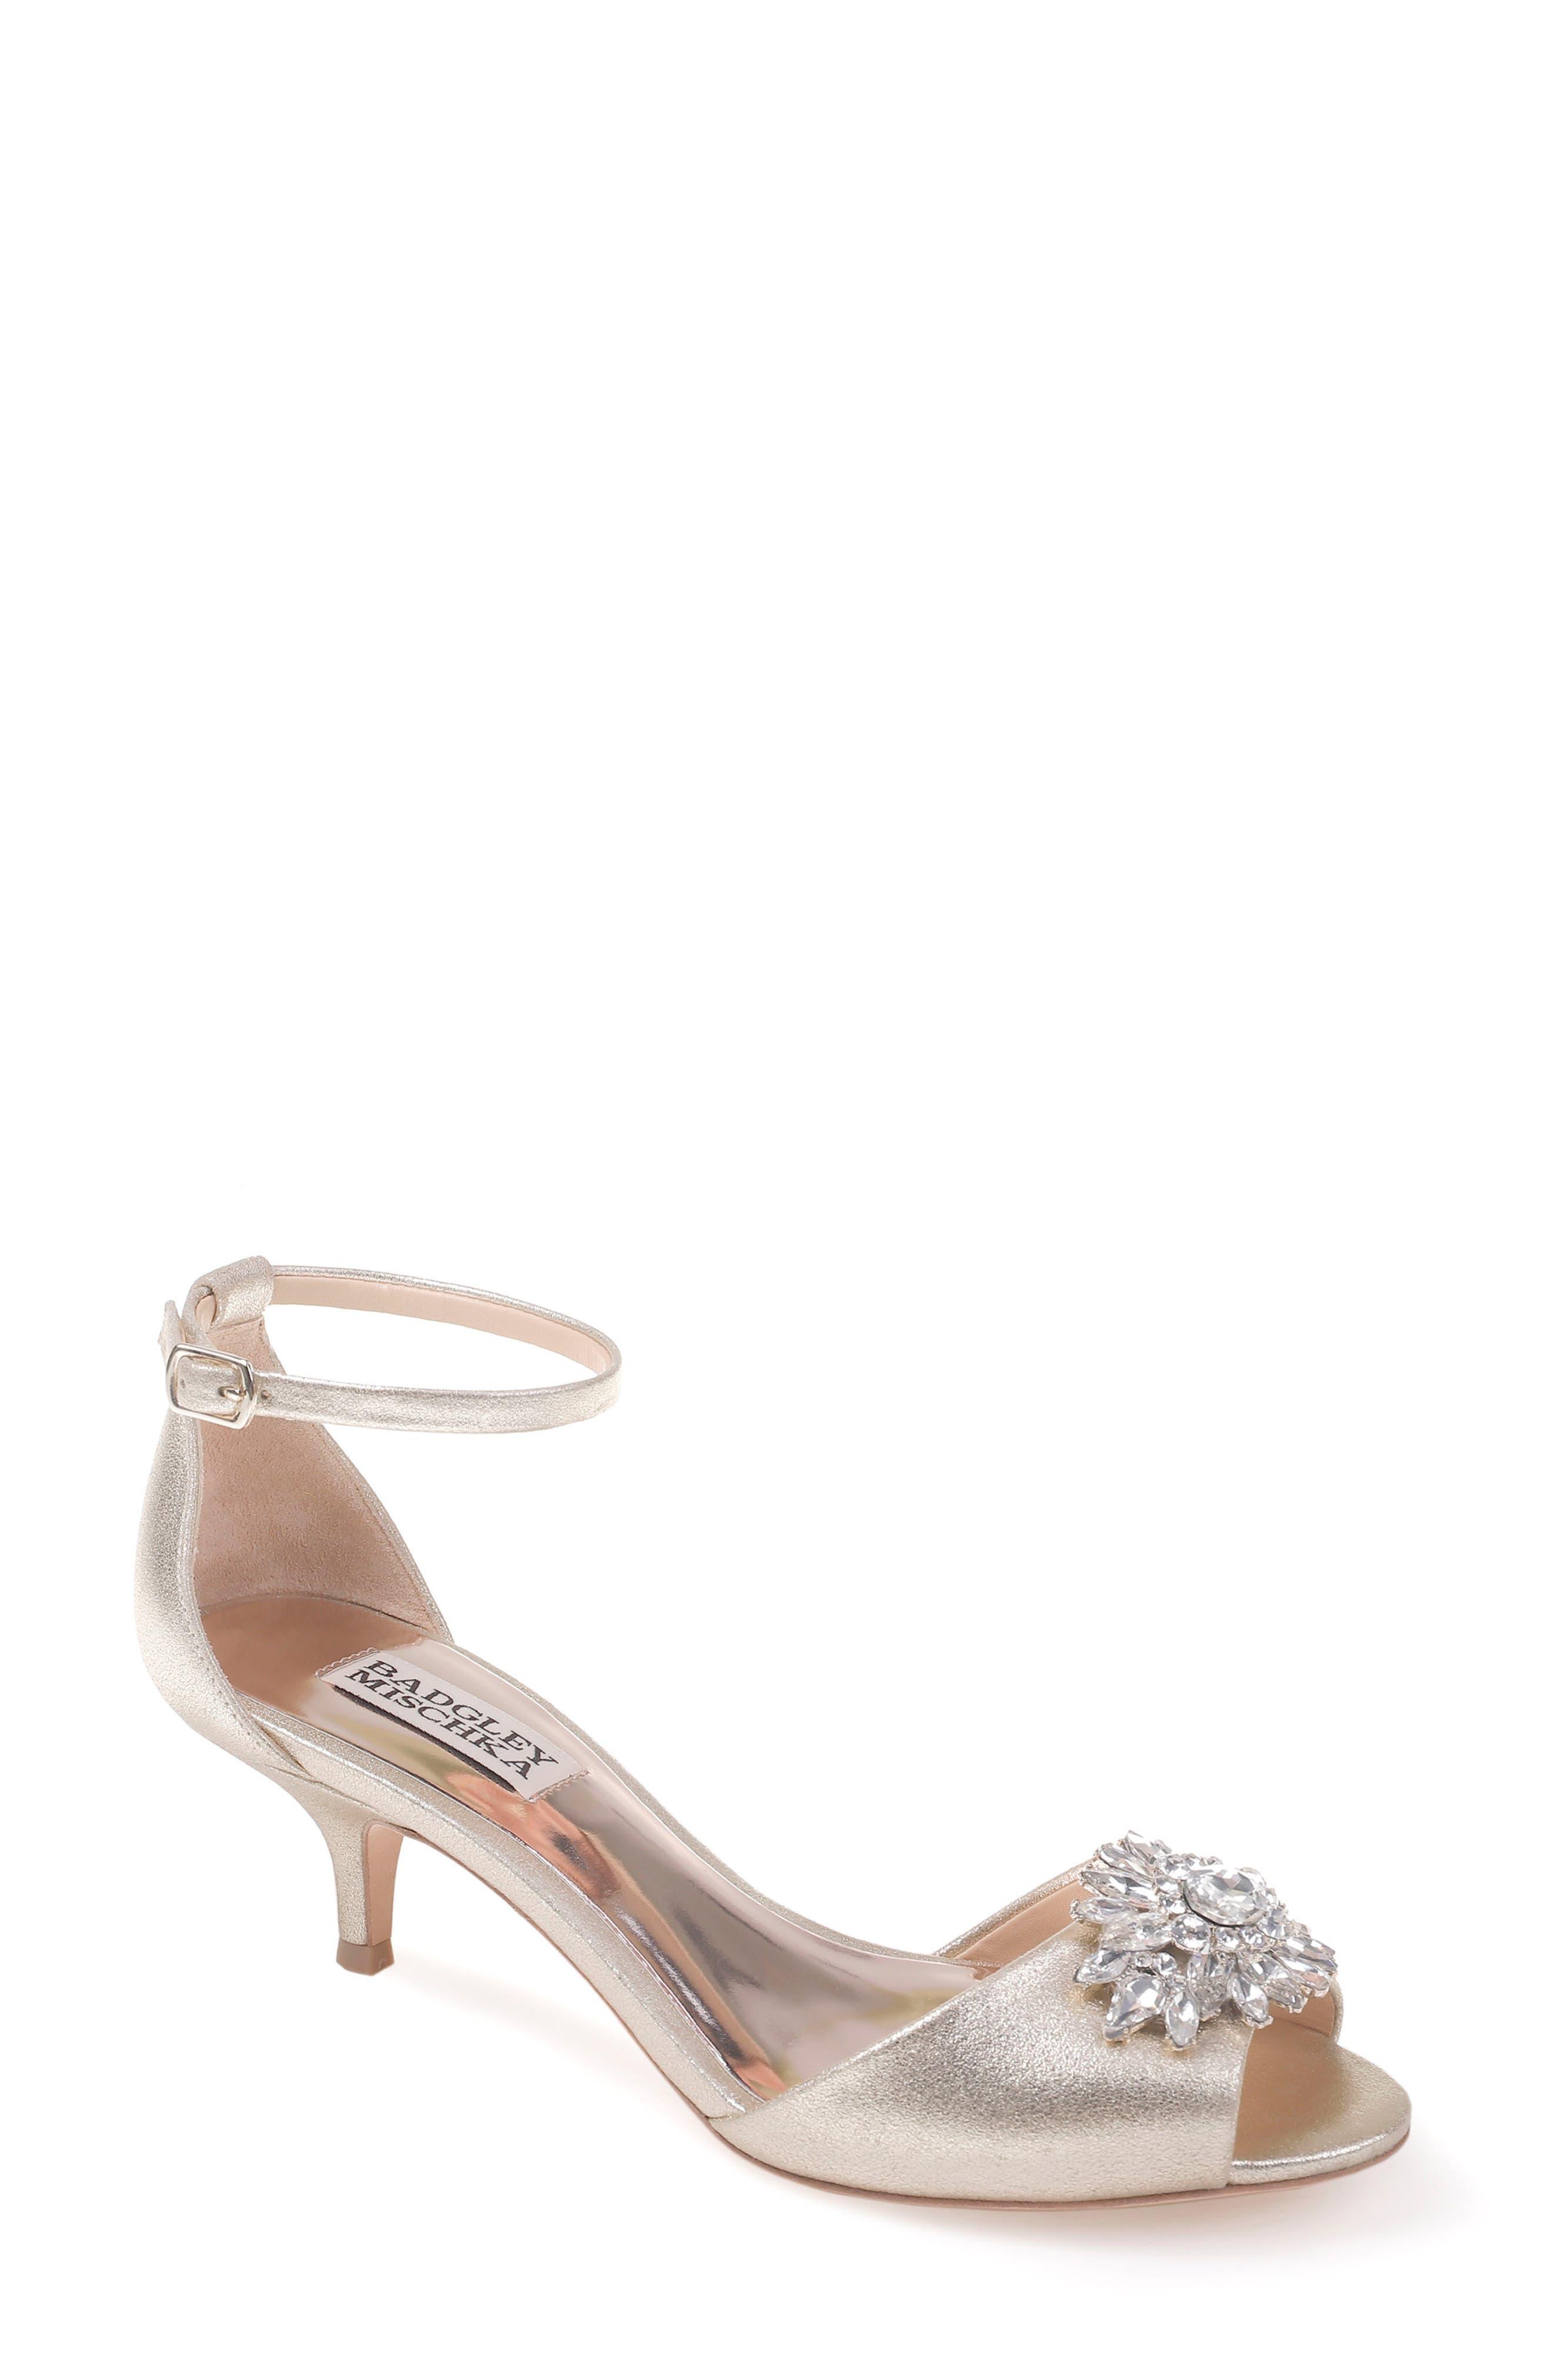 Sainte Crystal Embellished Sandal,                             Main thumbnail 5, color,